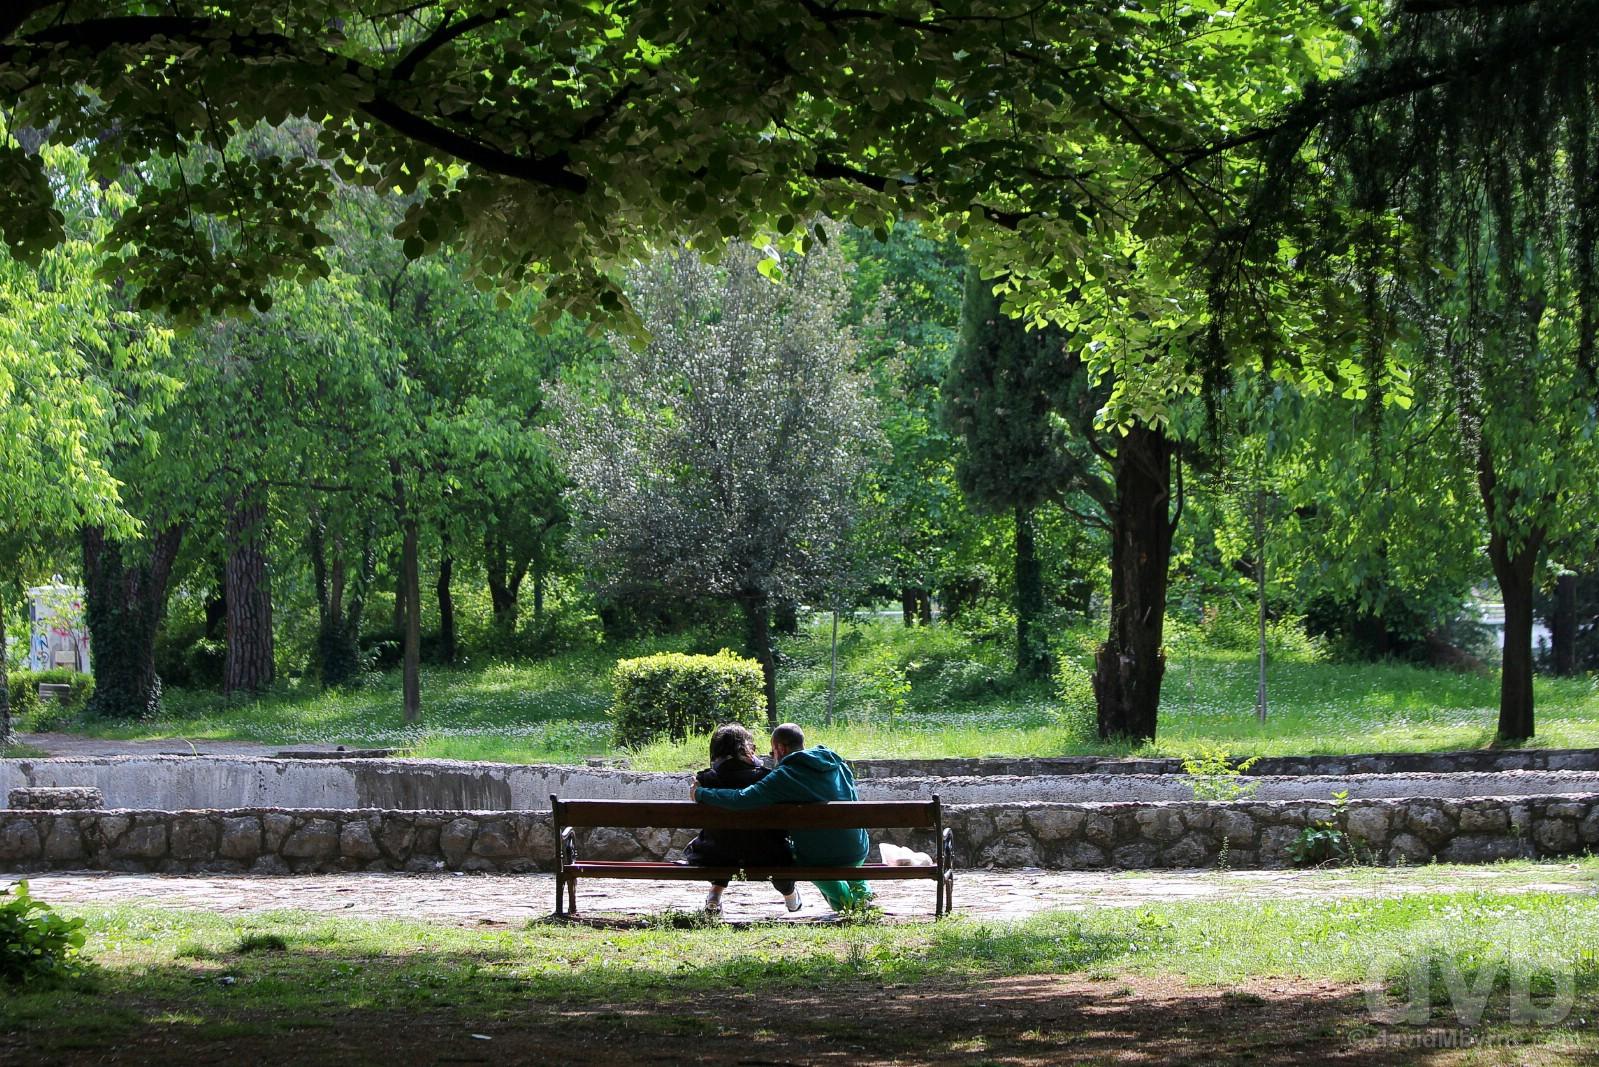 Njegosev Park, Podgorica, Montenegro. April 21, 2017.